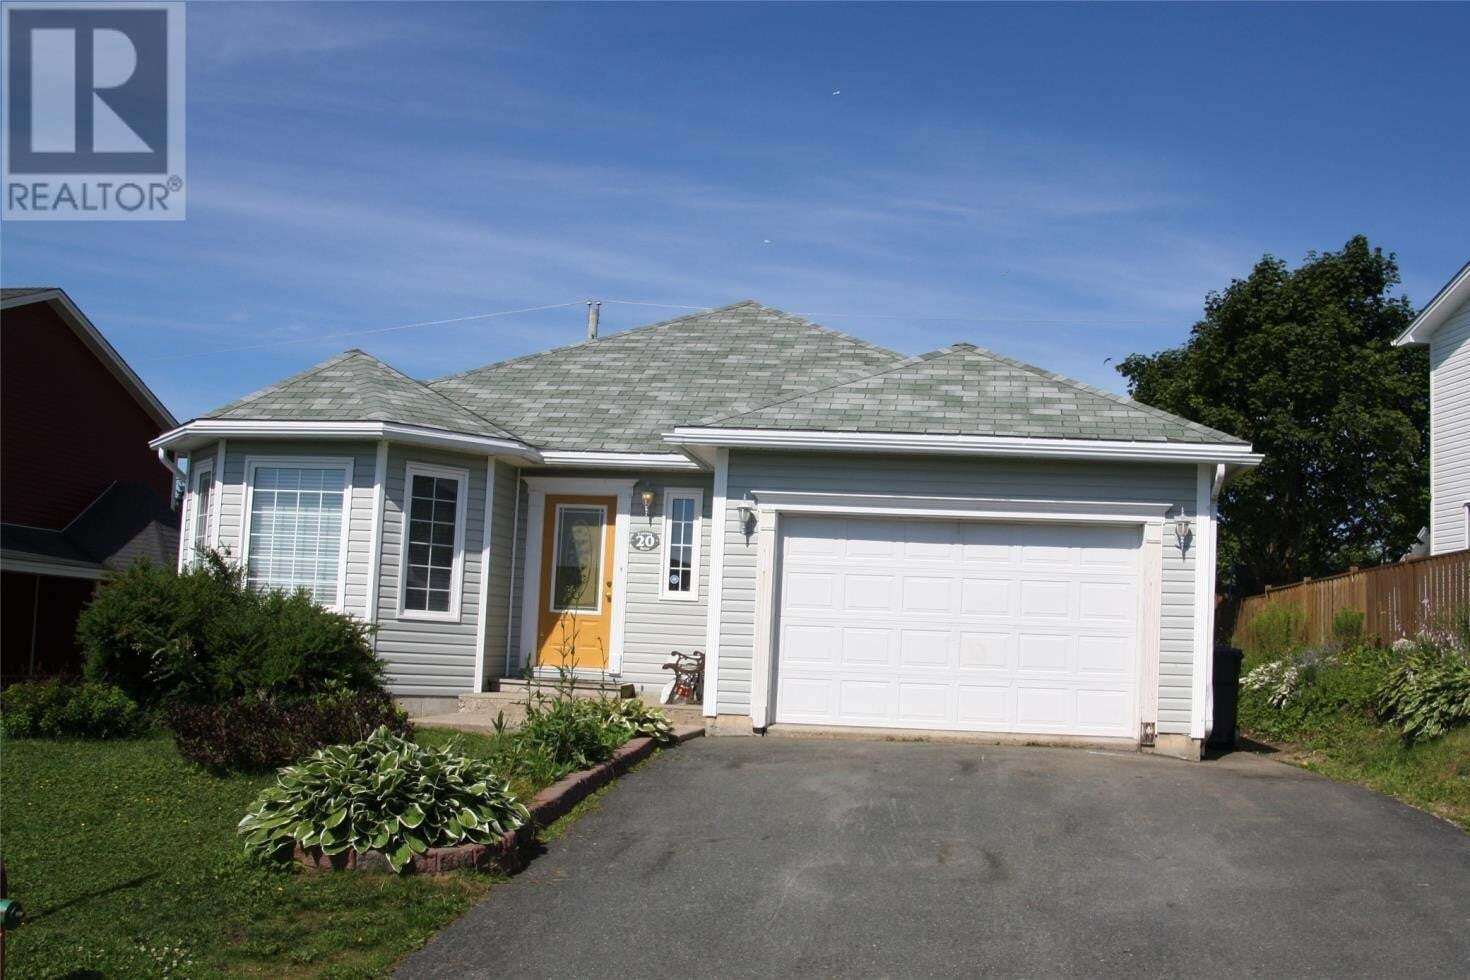 House for sale at 20 Castors Dr Mt. Pearl Newfoundland - MLS: 1218473